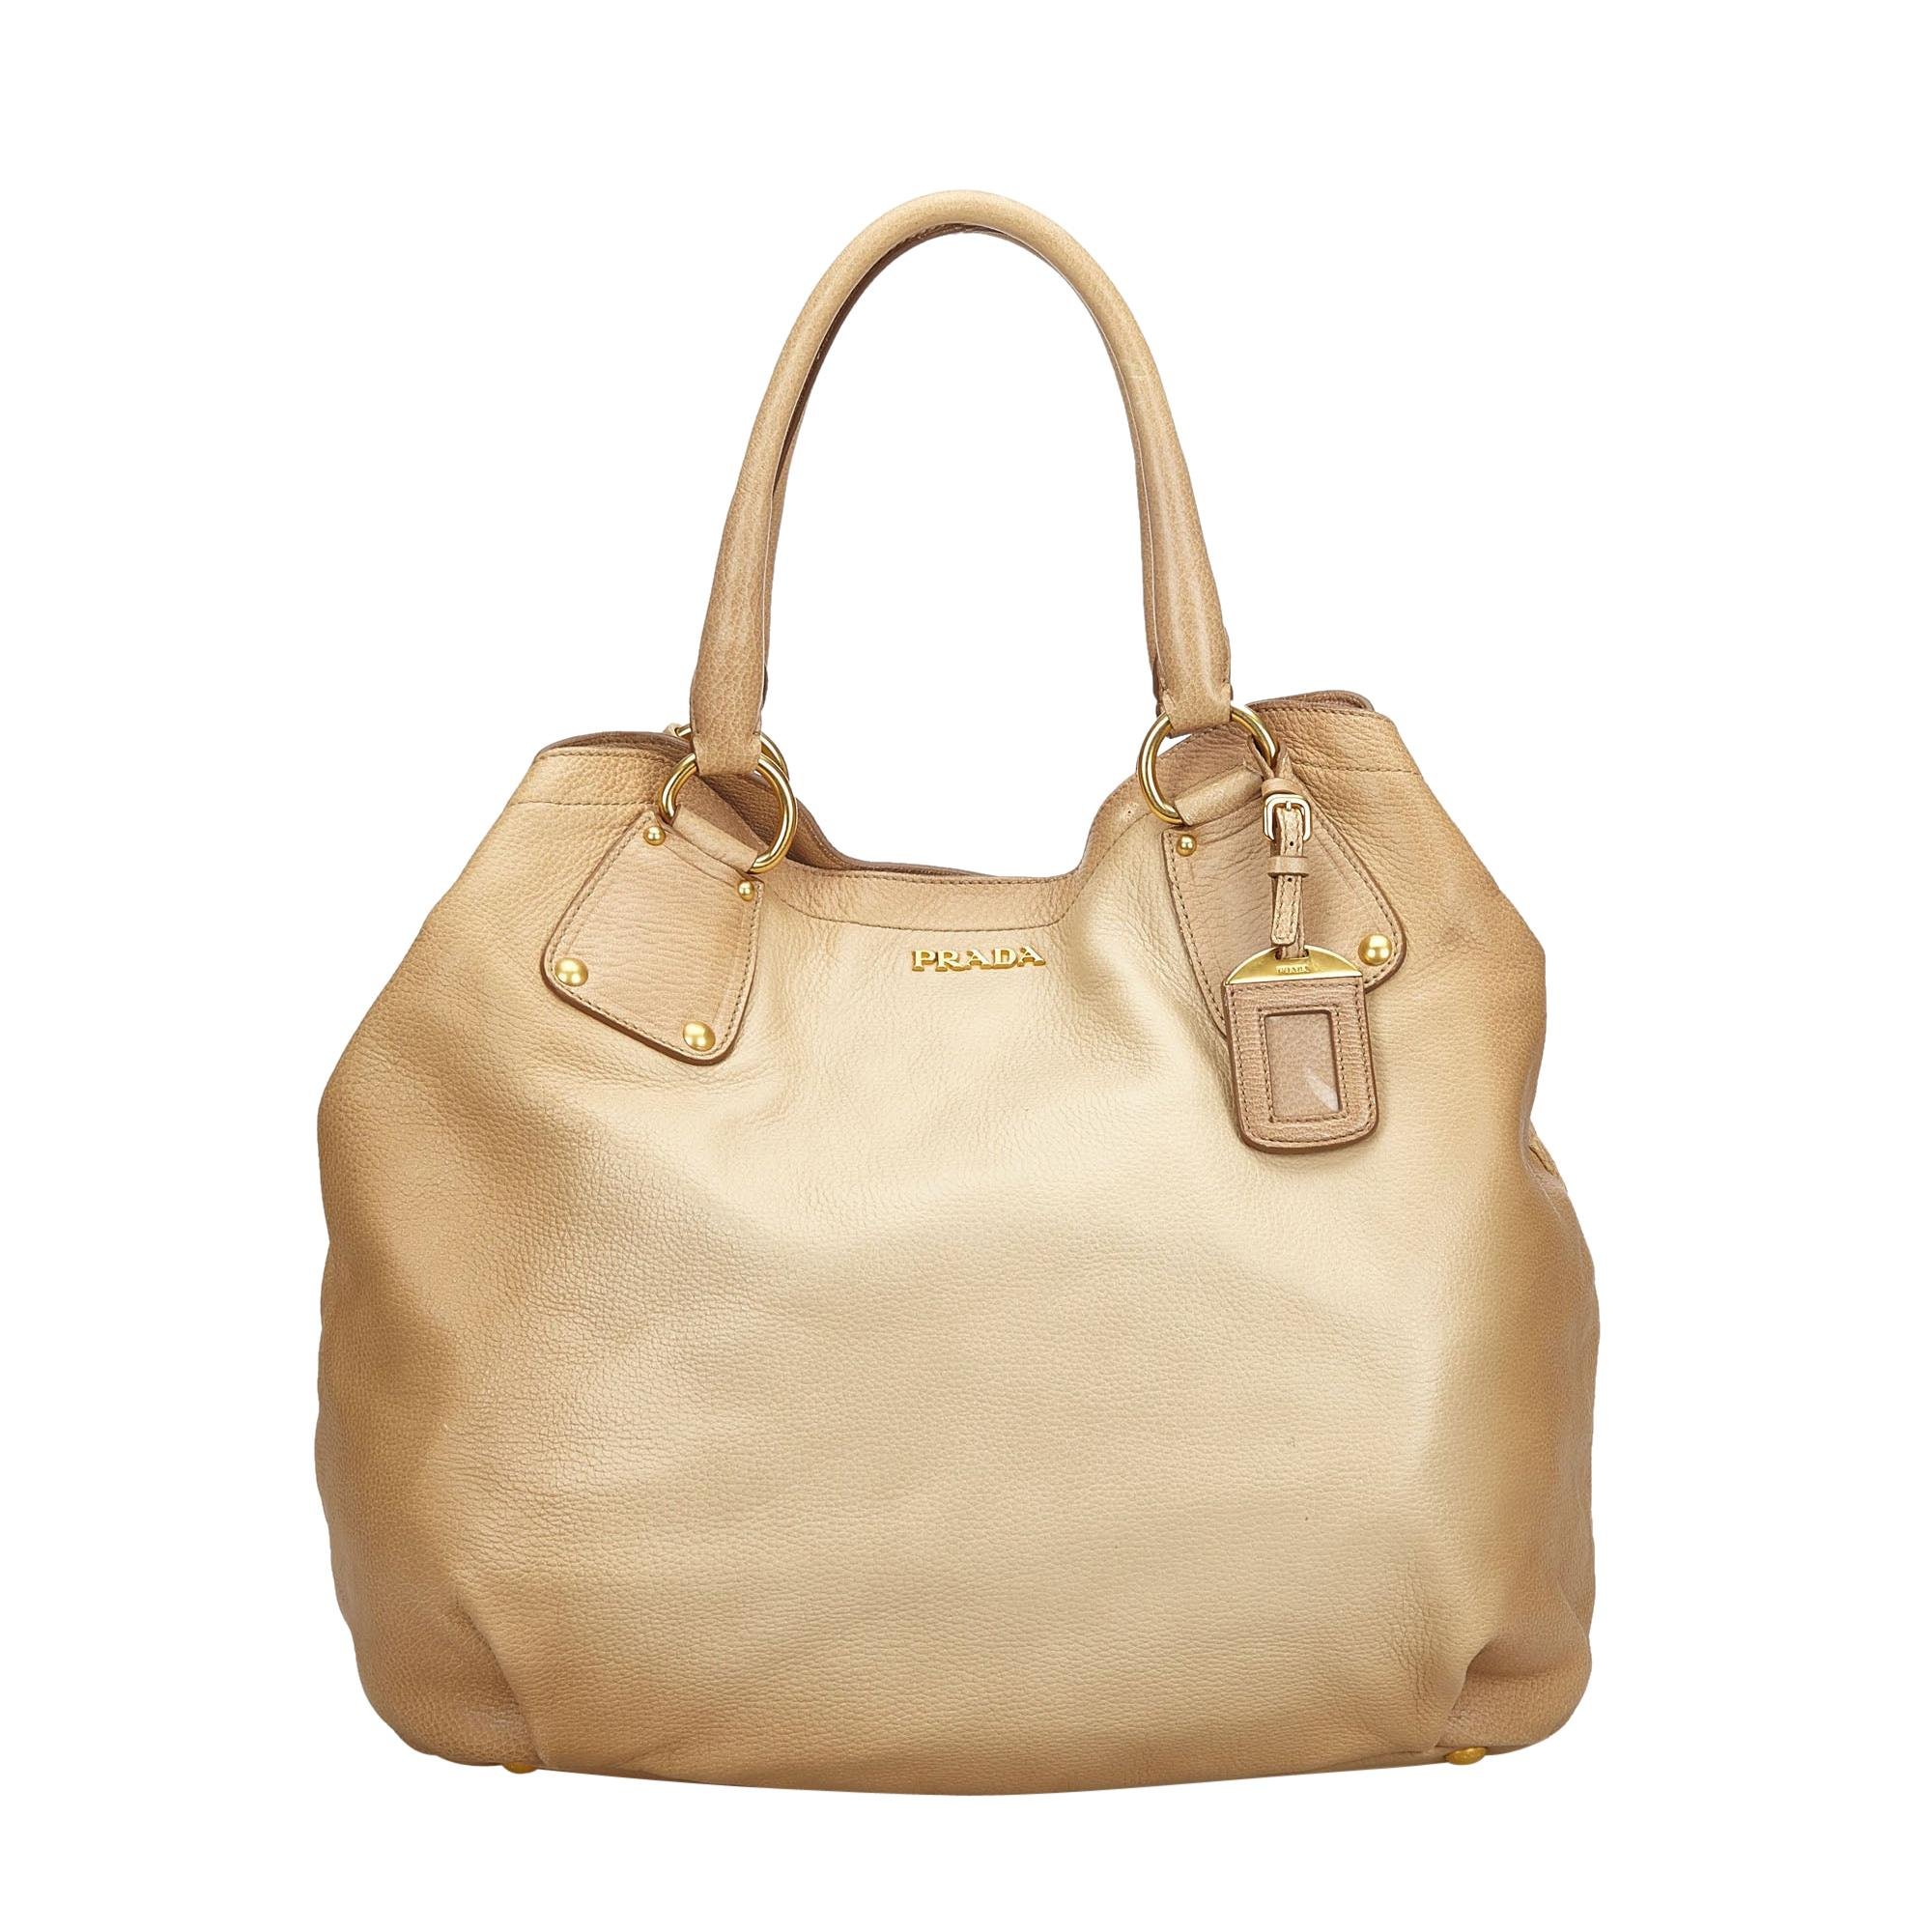 e356ac14aa6 Vintage Prada Handbags and Purses - 1,347 For Sale at 1stdibs